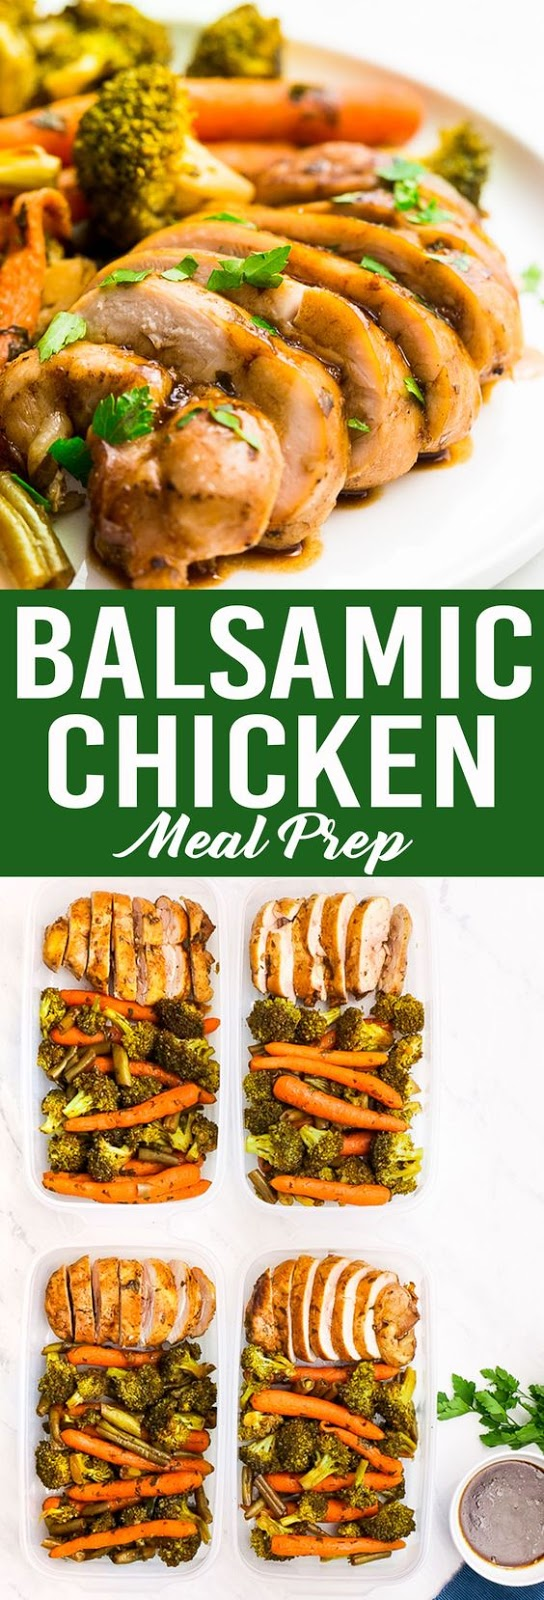 Balsamic Chicken & Veggies (Meal Prep)